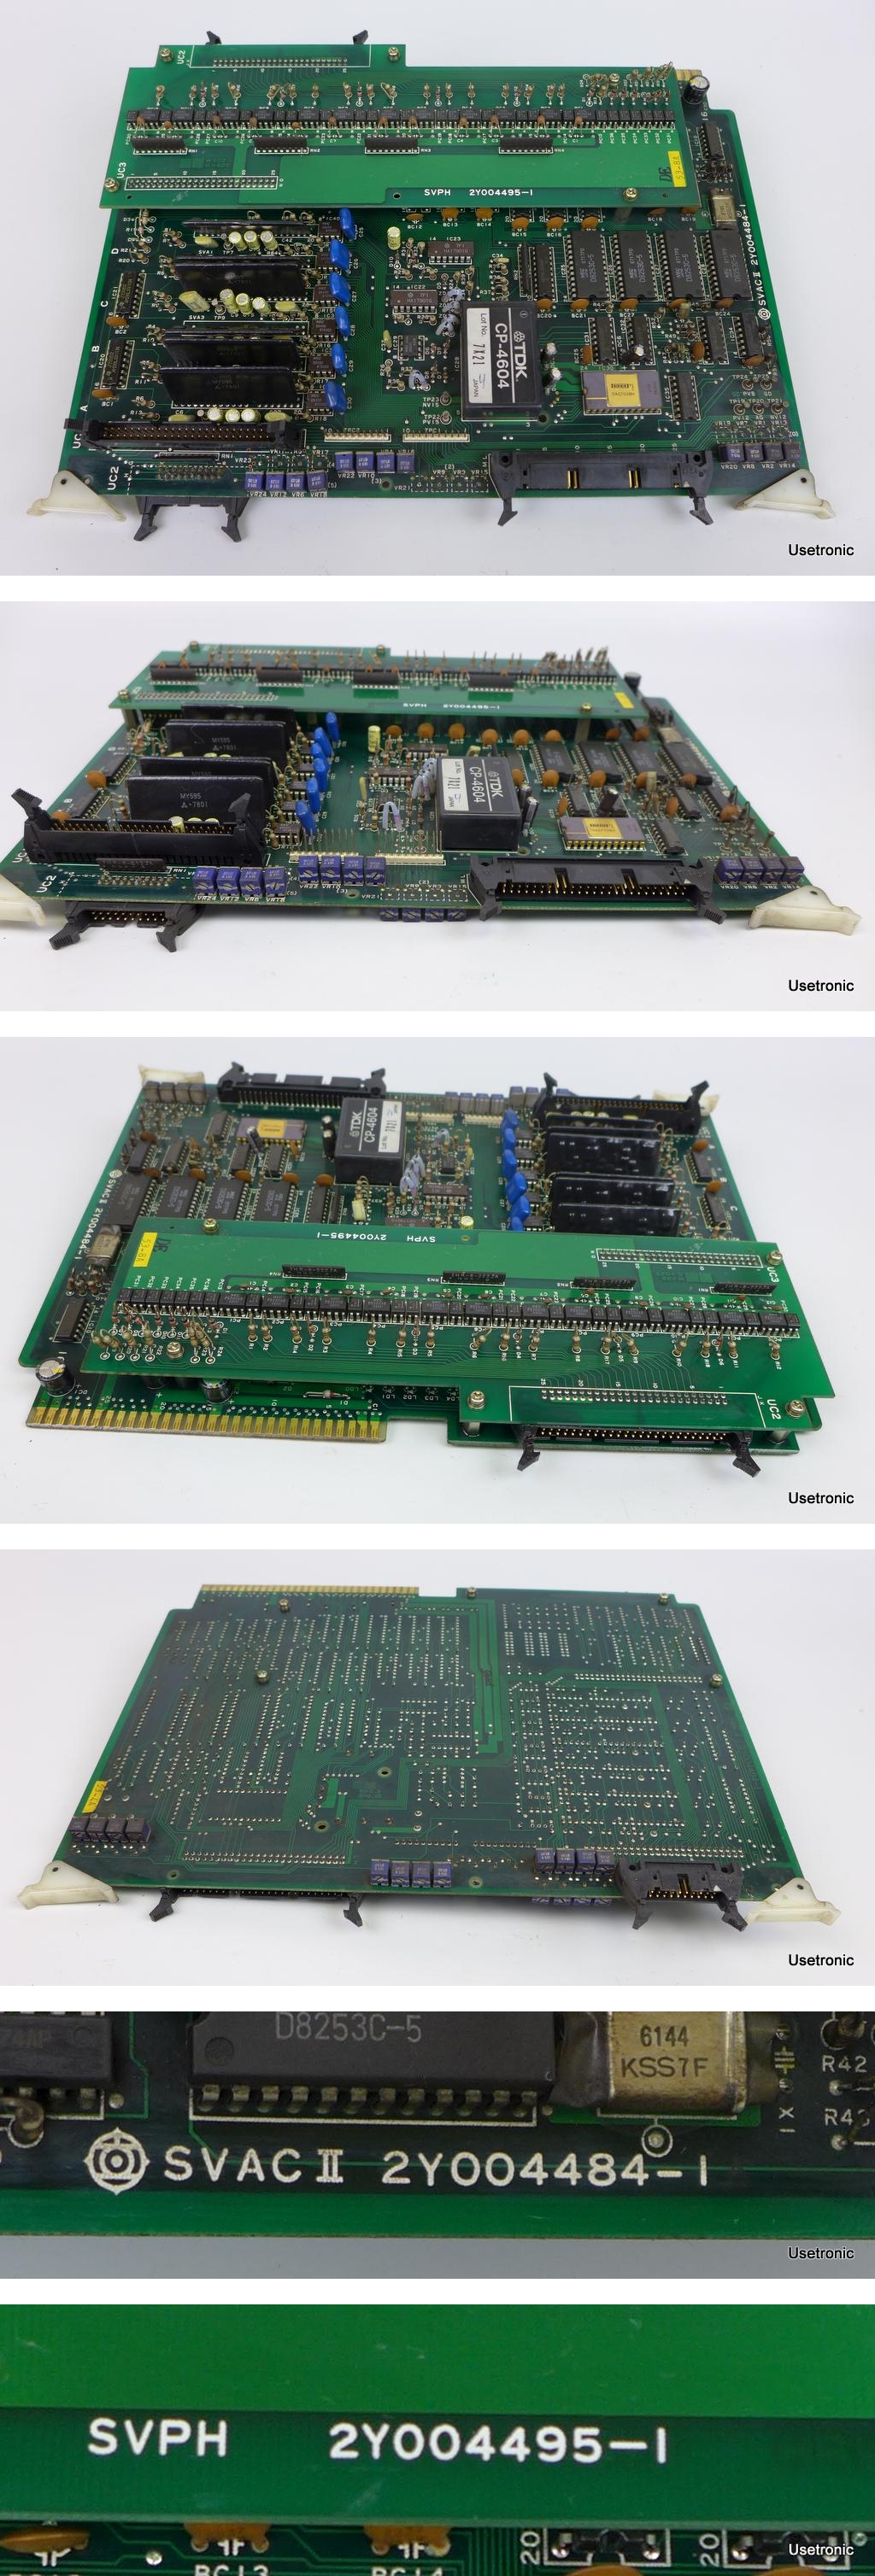 Hitachi SVAC II 2Y004484-1 SVPH 2Y004495-1